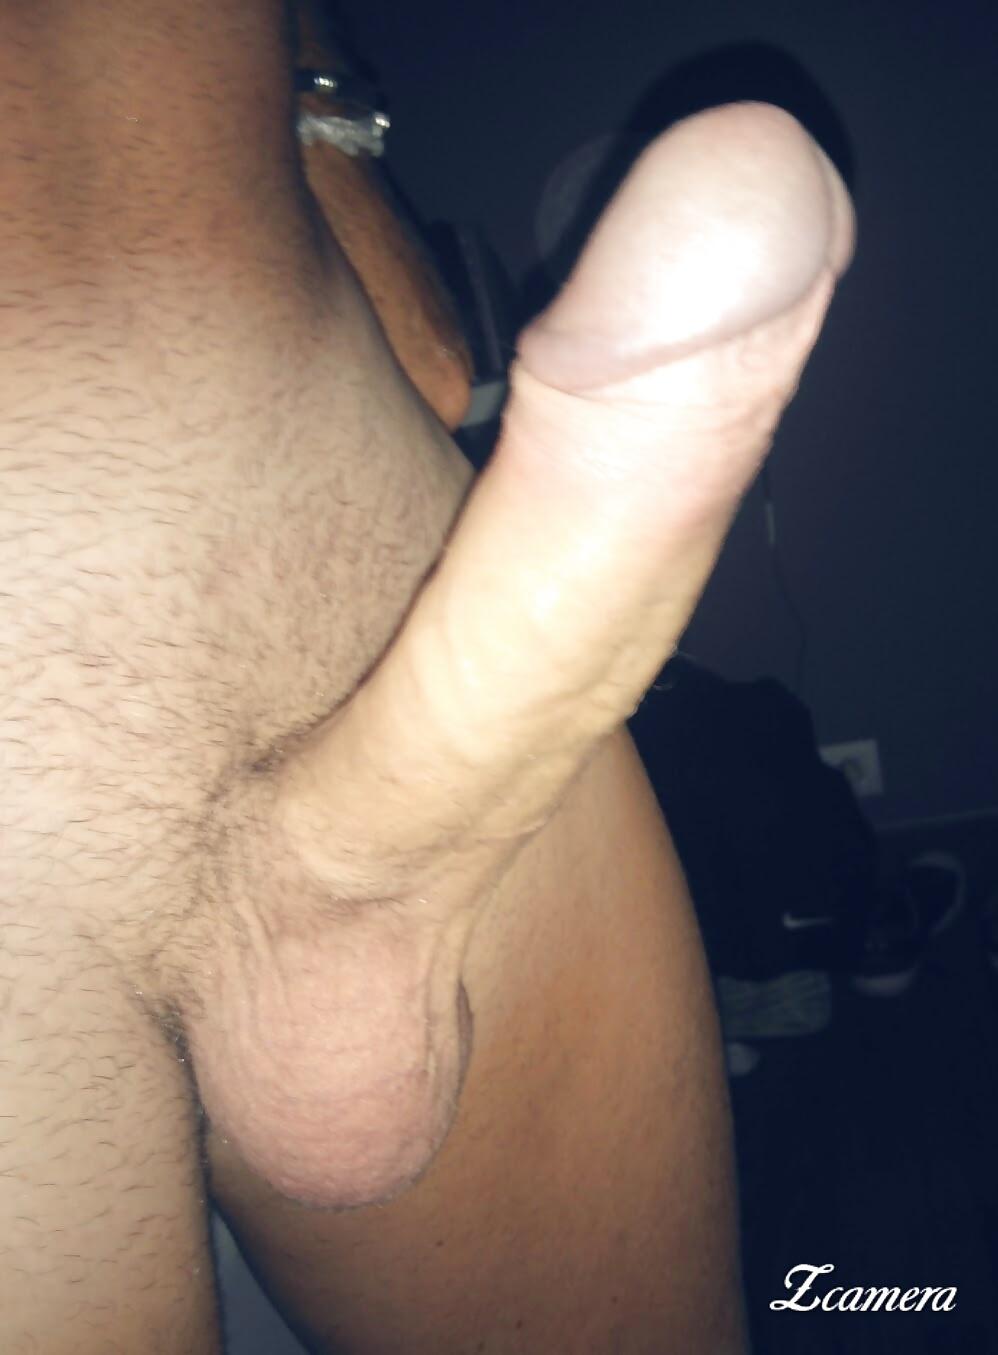 Penisporno